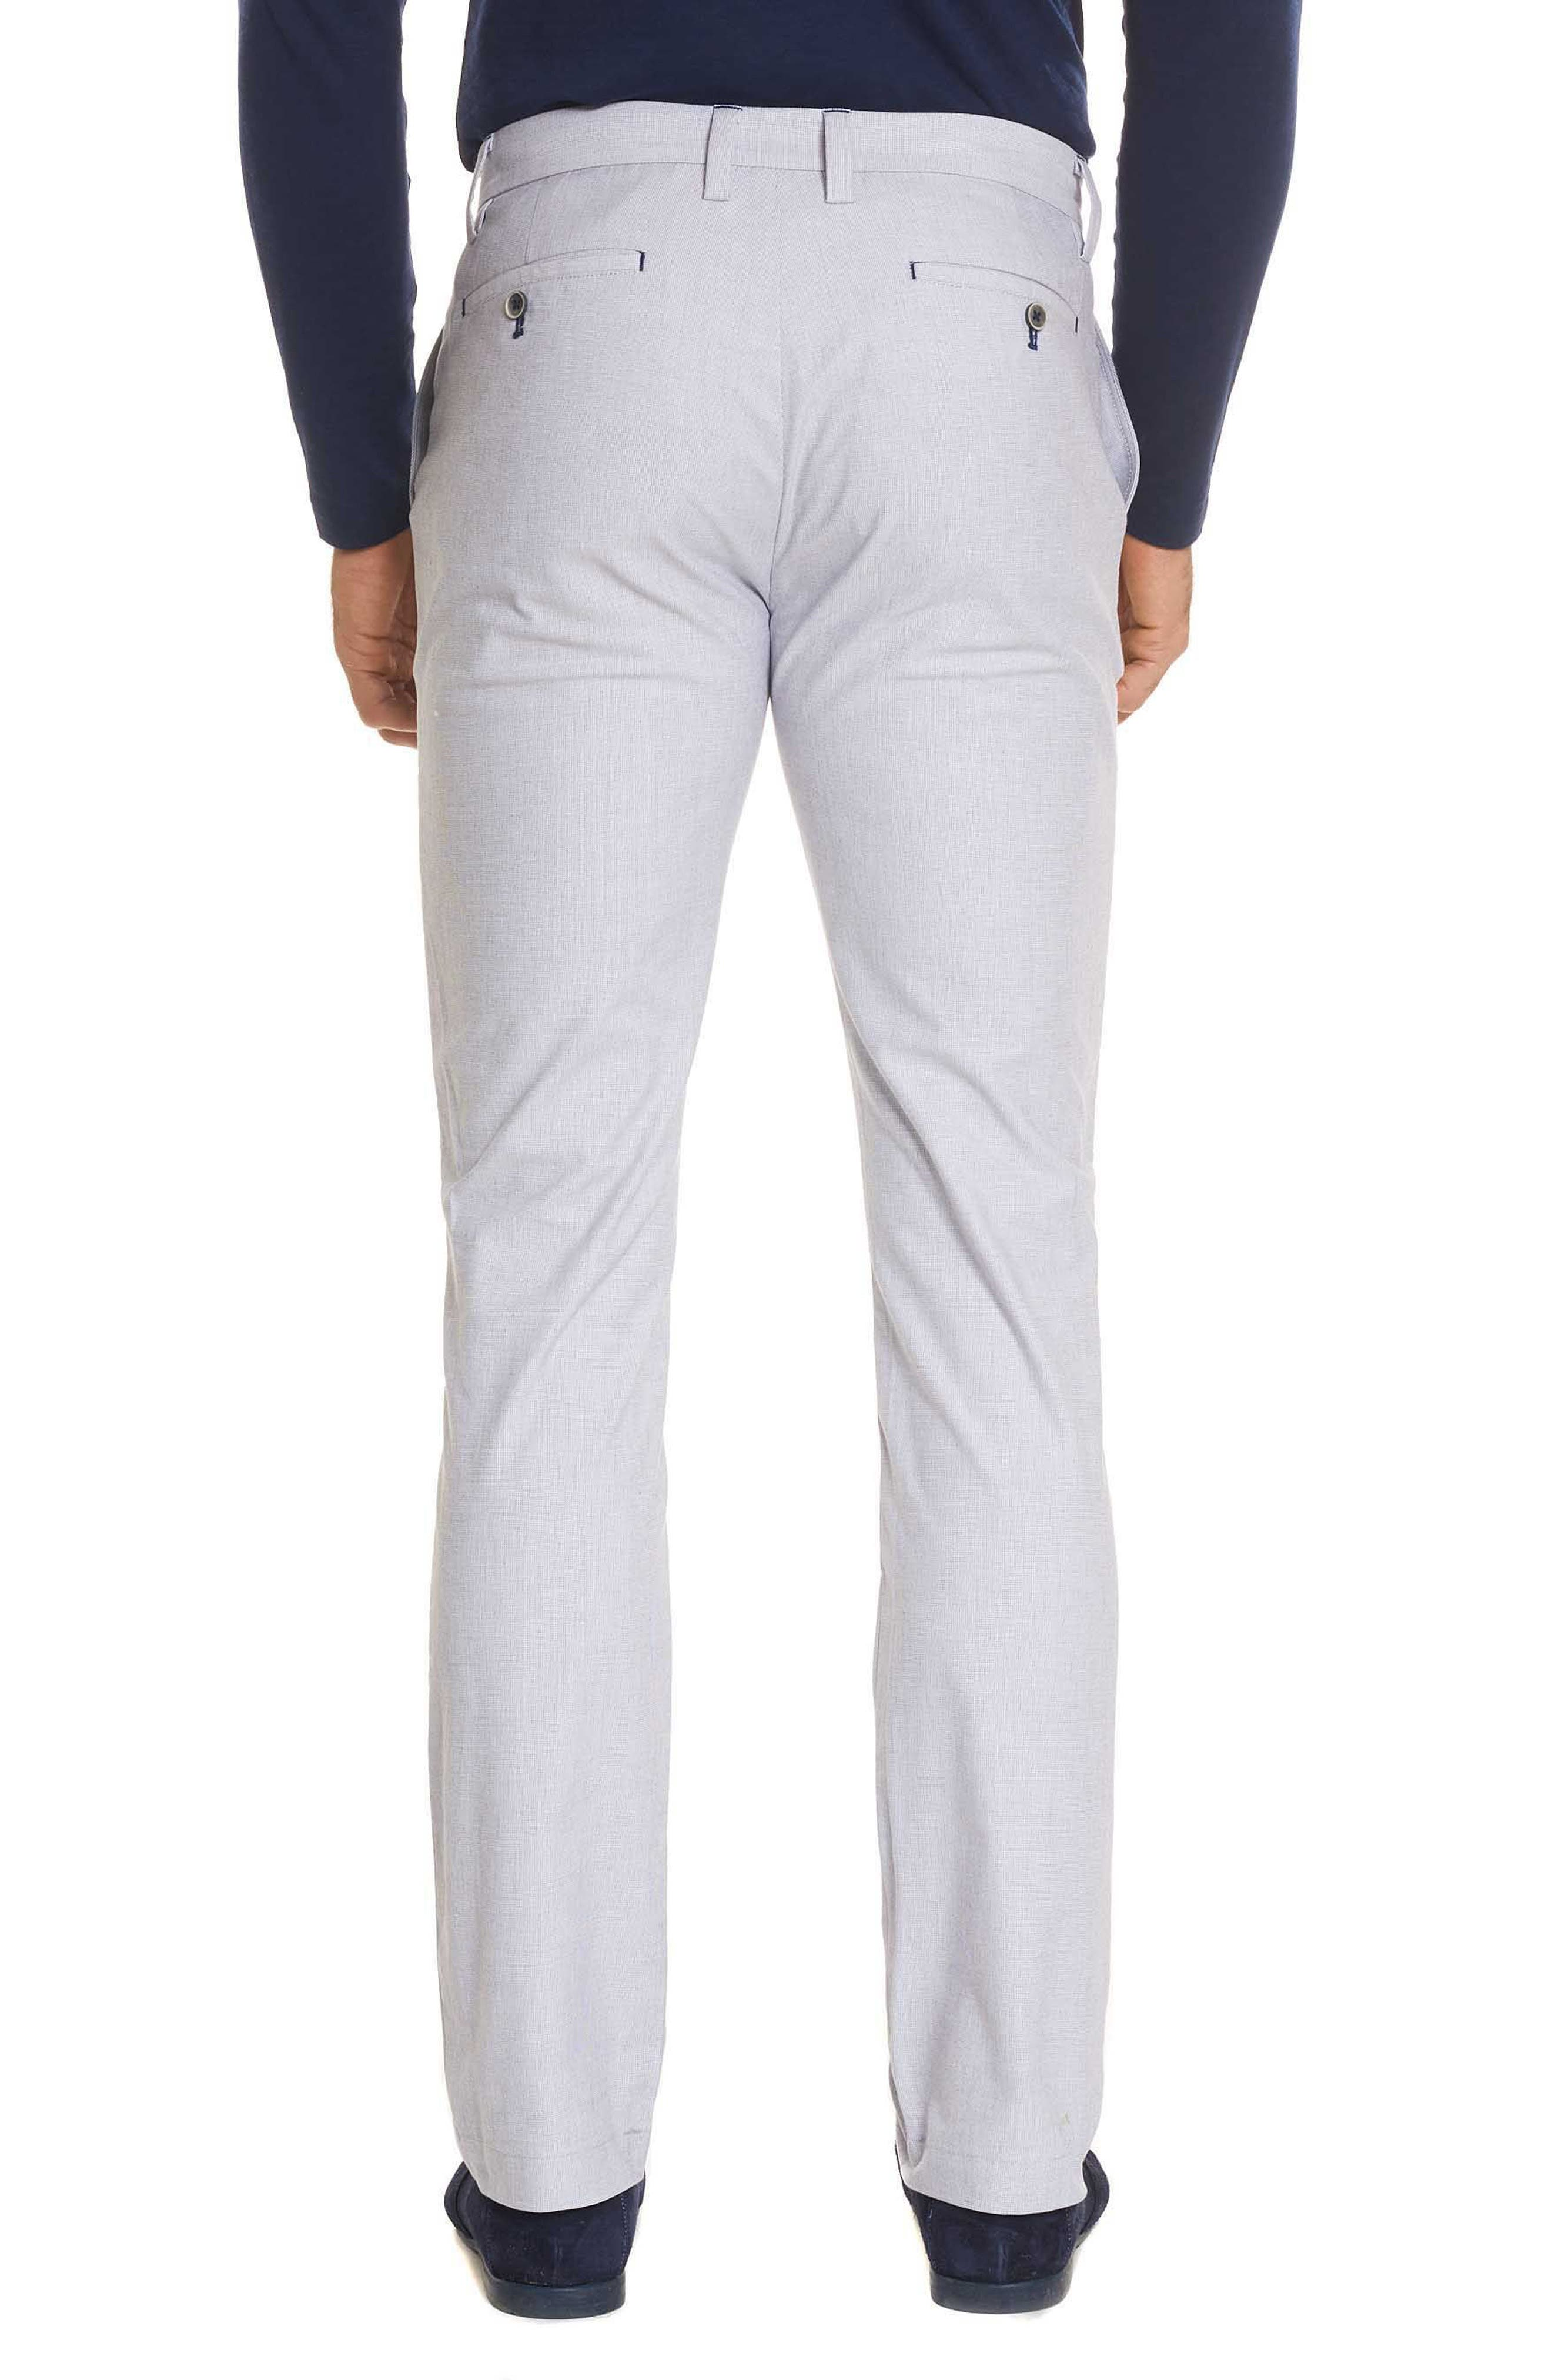 Gerardo Tailored Fit Pants,                             Alternate thumbnail 2, color,                             White